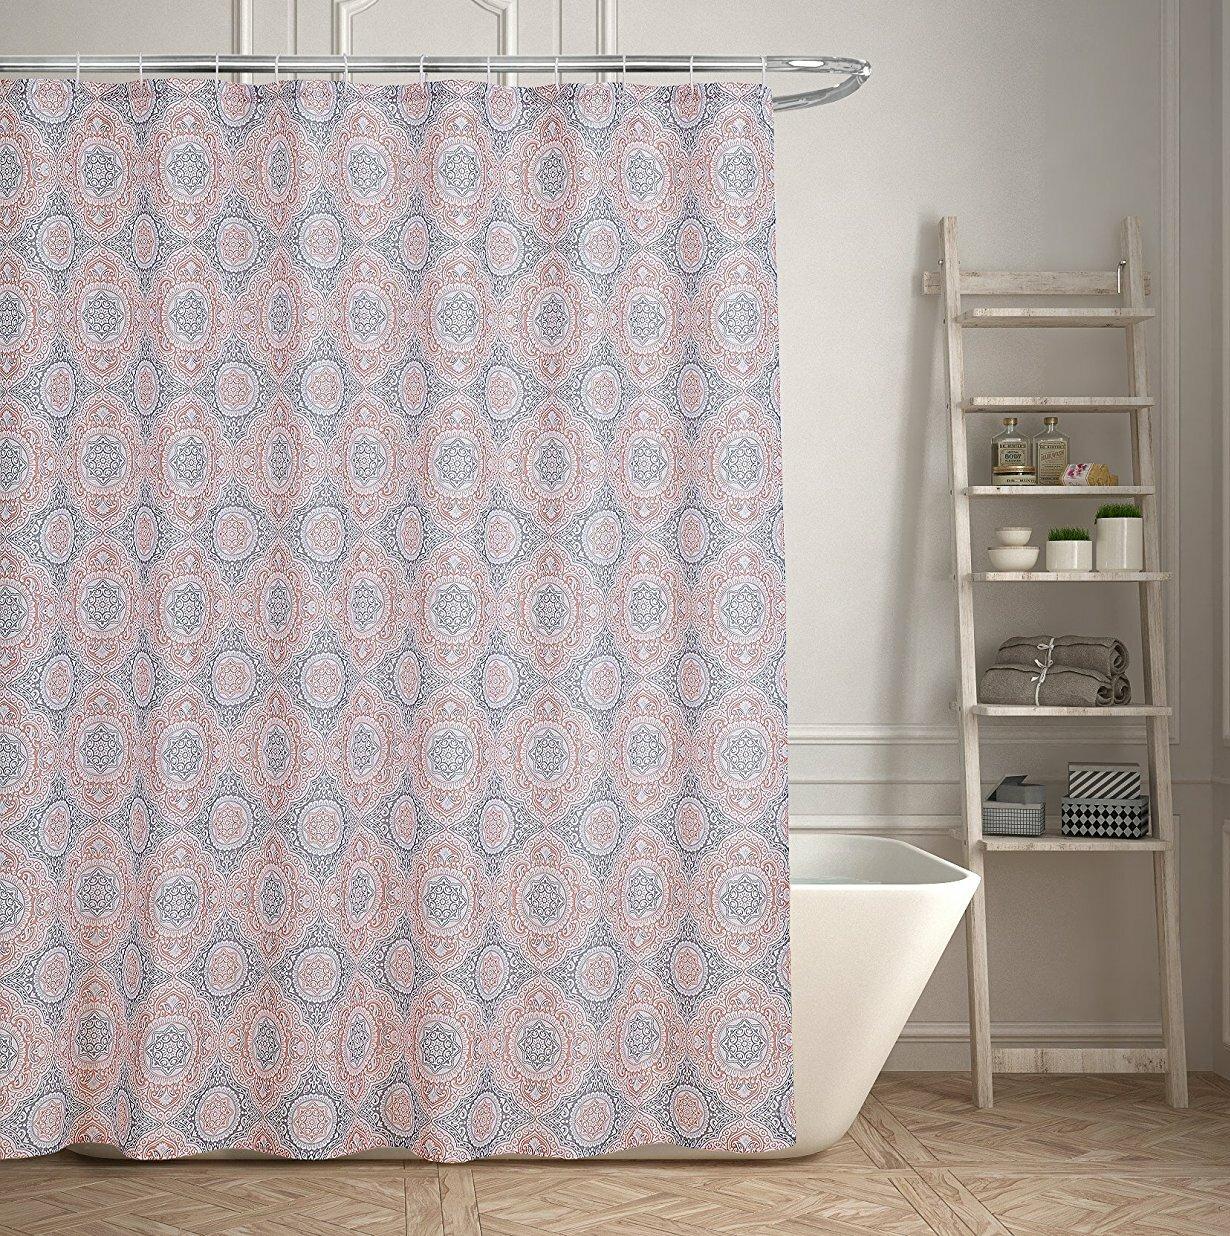 Bungalow Rose Contemporary Geometric Medallion Shower Curtain | Wayfair